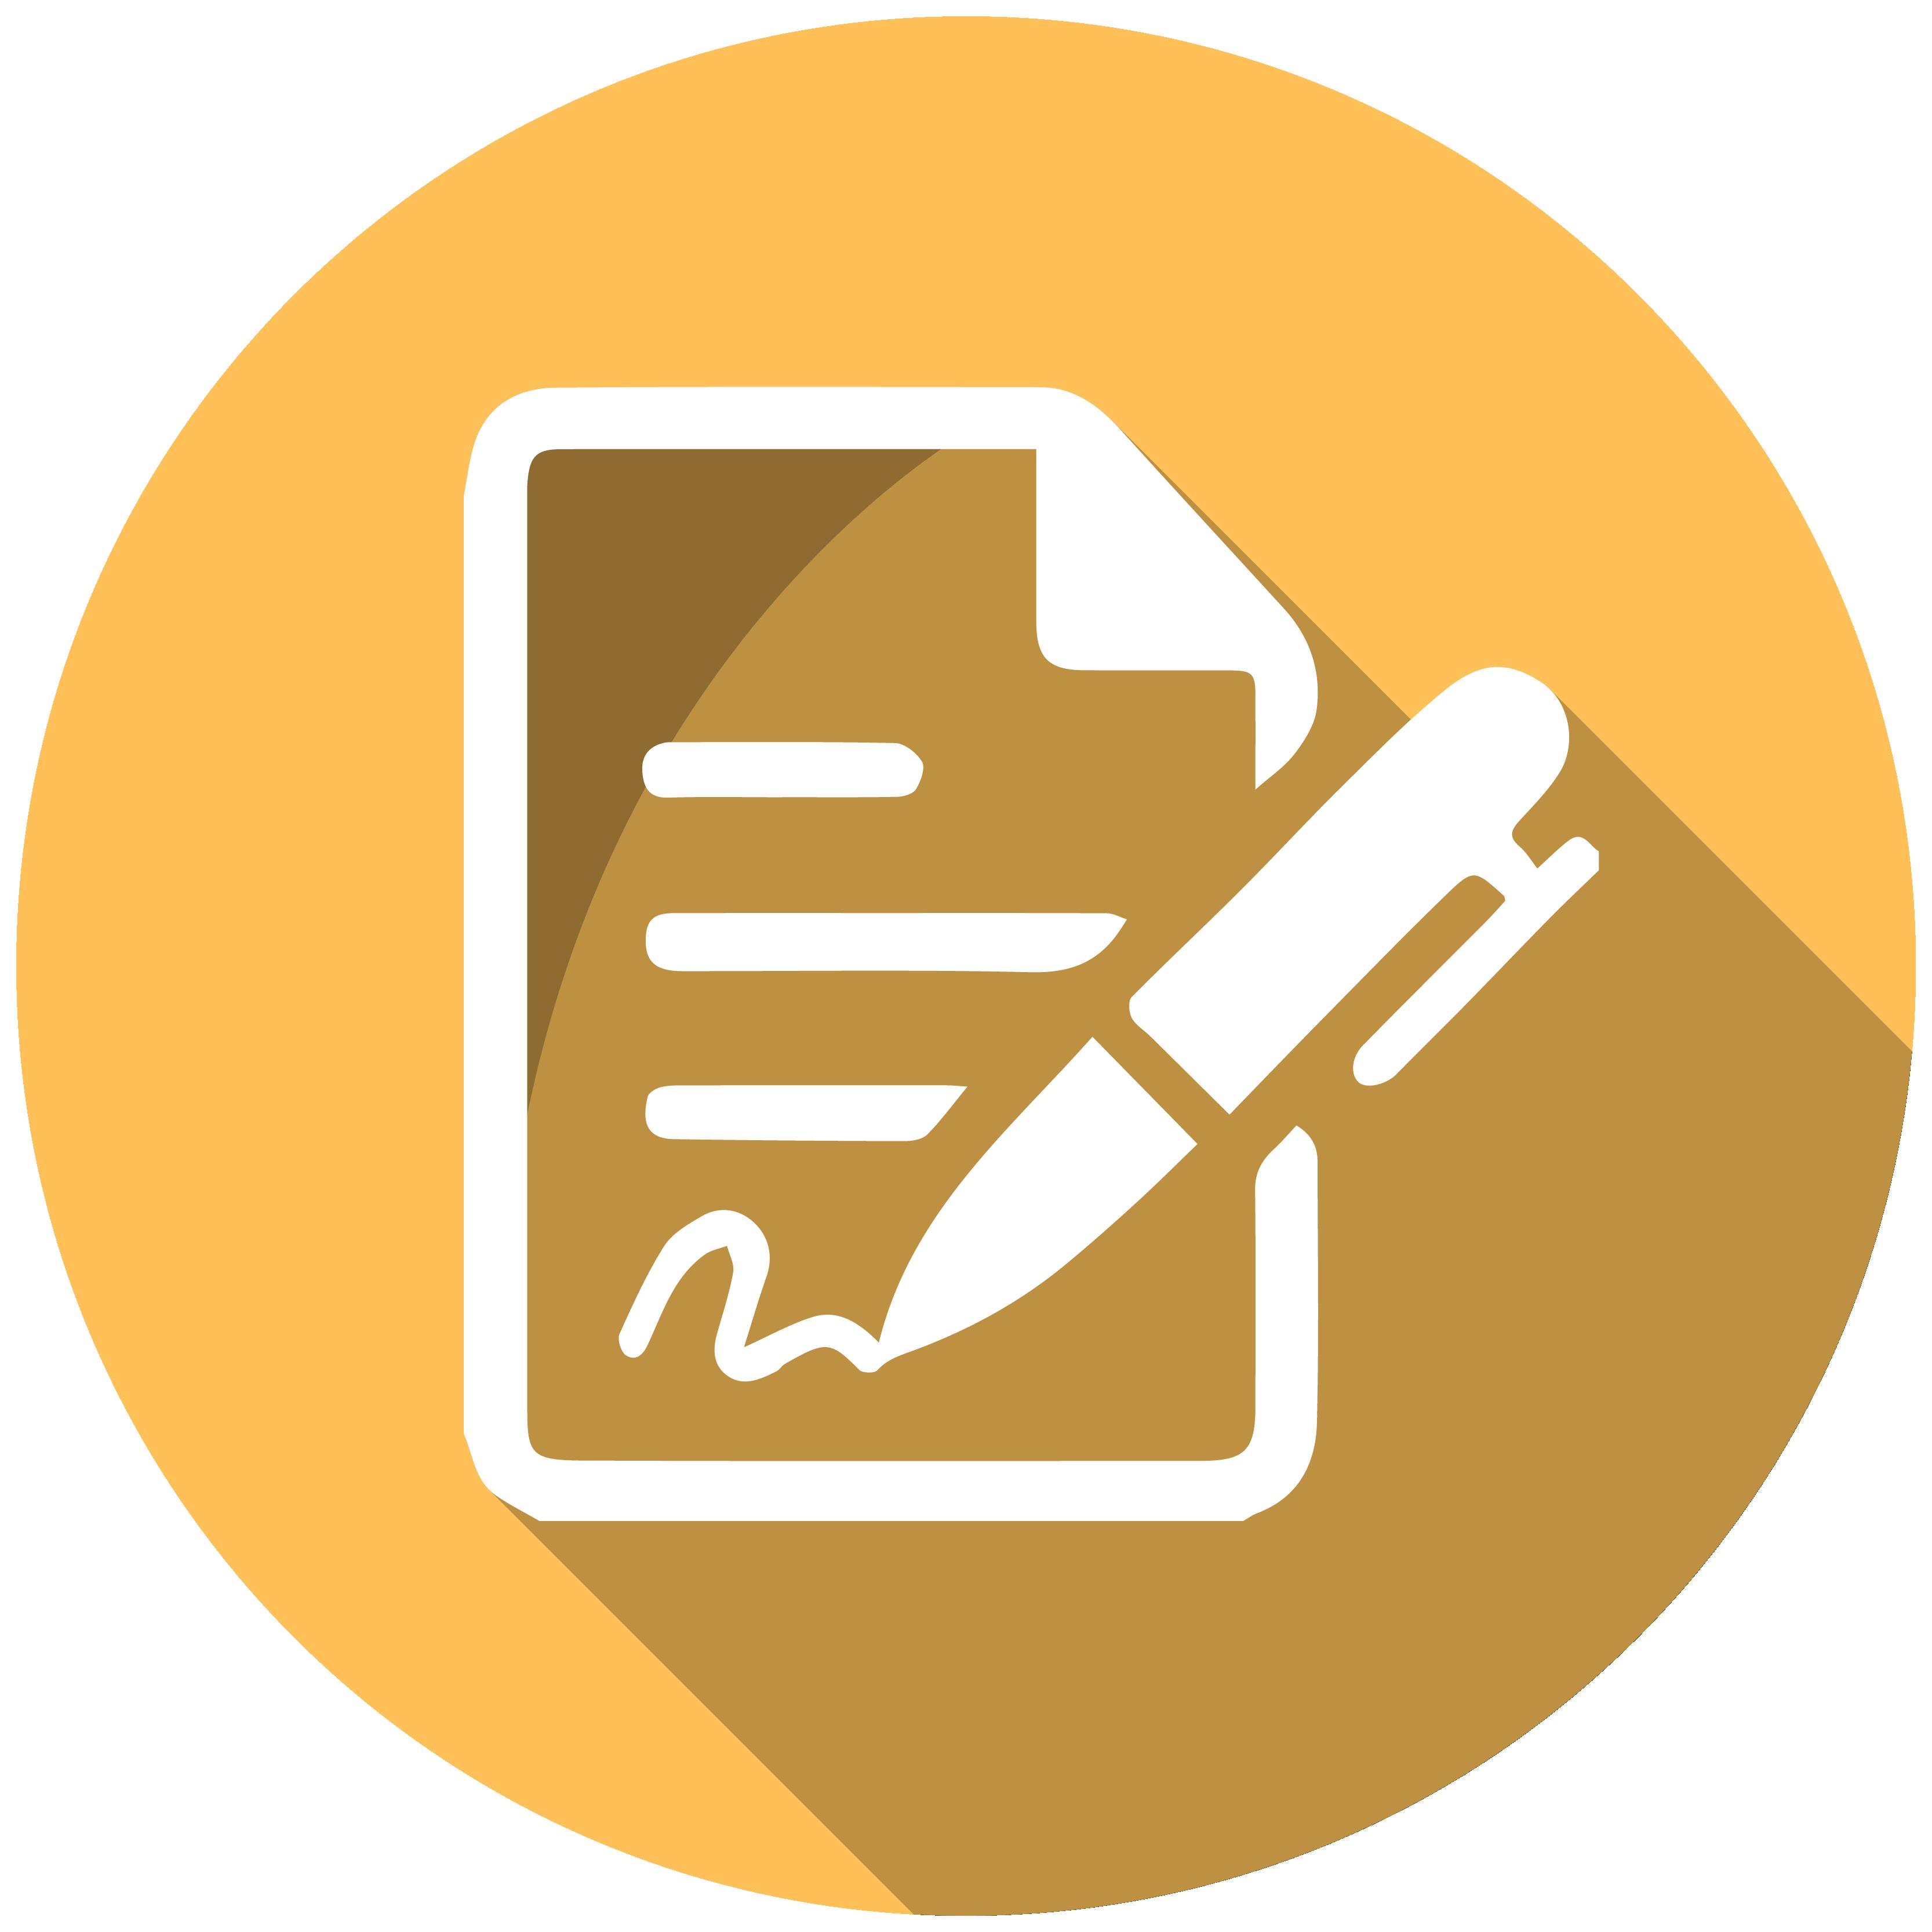 چارچوب نظری و پیشینه پژوهش رفتار شهروندی سازمانی